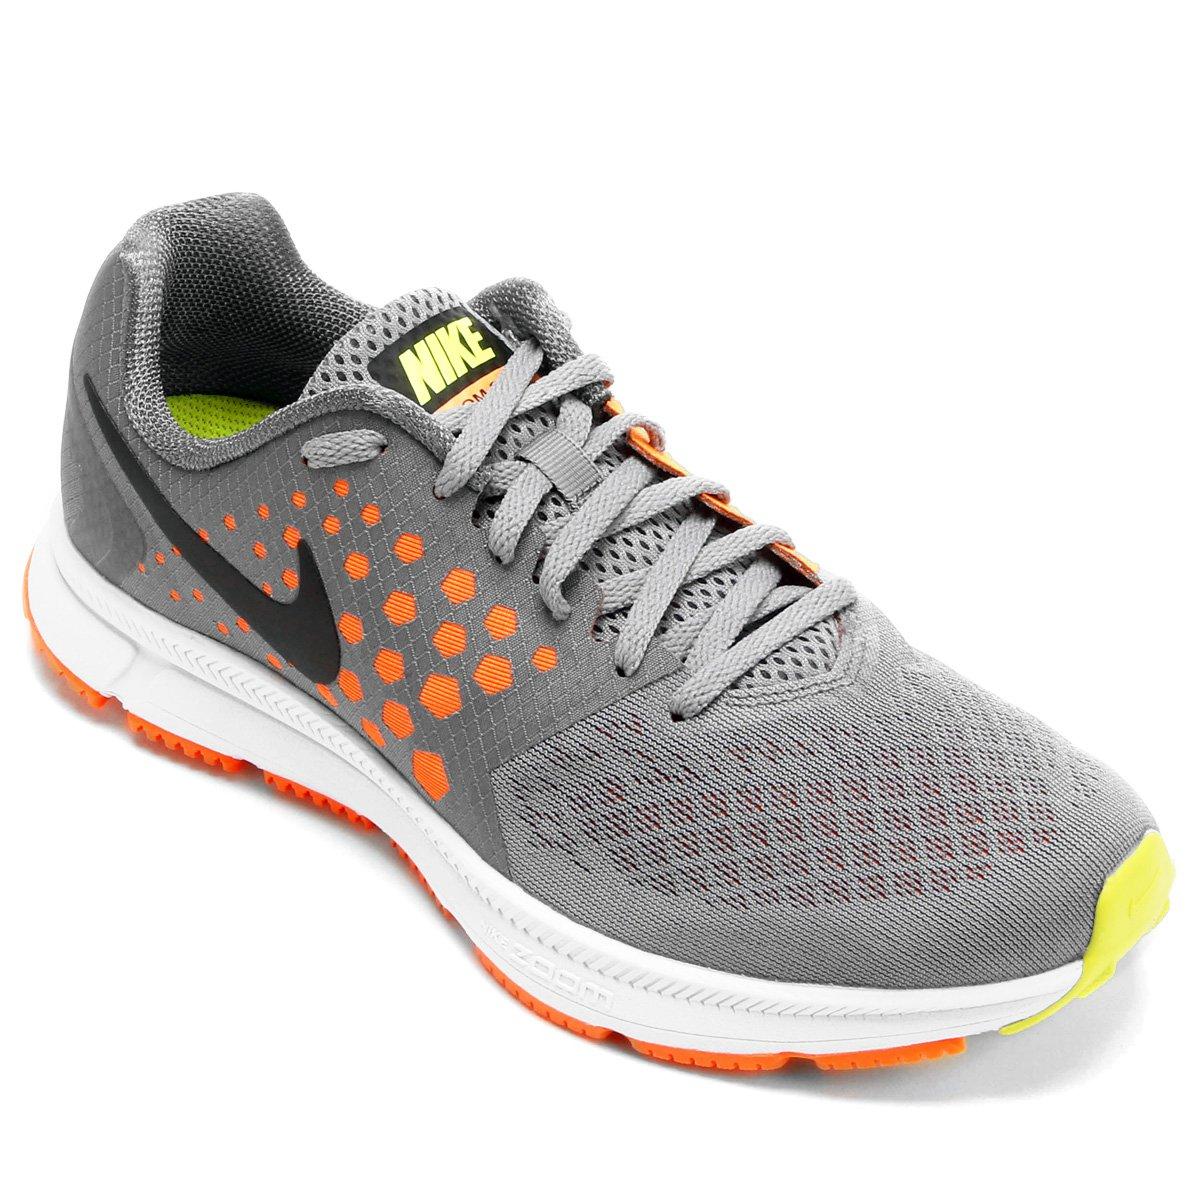 Tênis Nike Air Zoom Span Loja Masculino Compre Agora Loja Span do Inter  869cb6 37ec03e43b53c